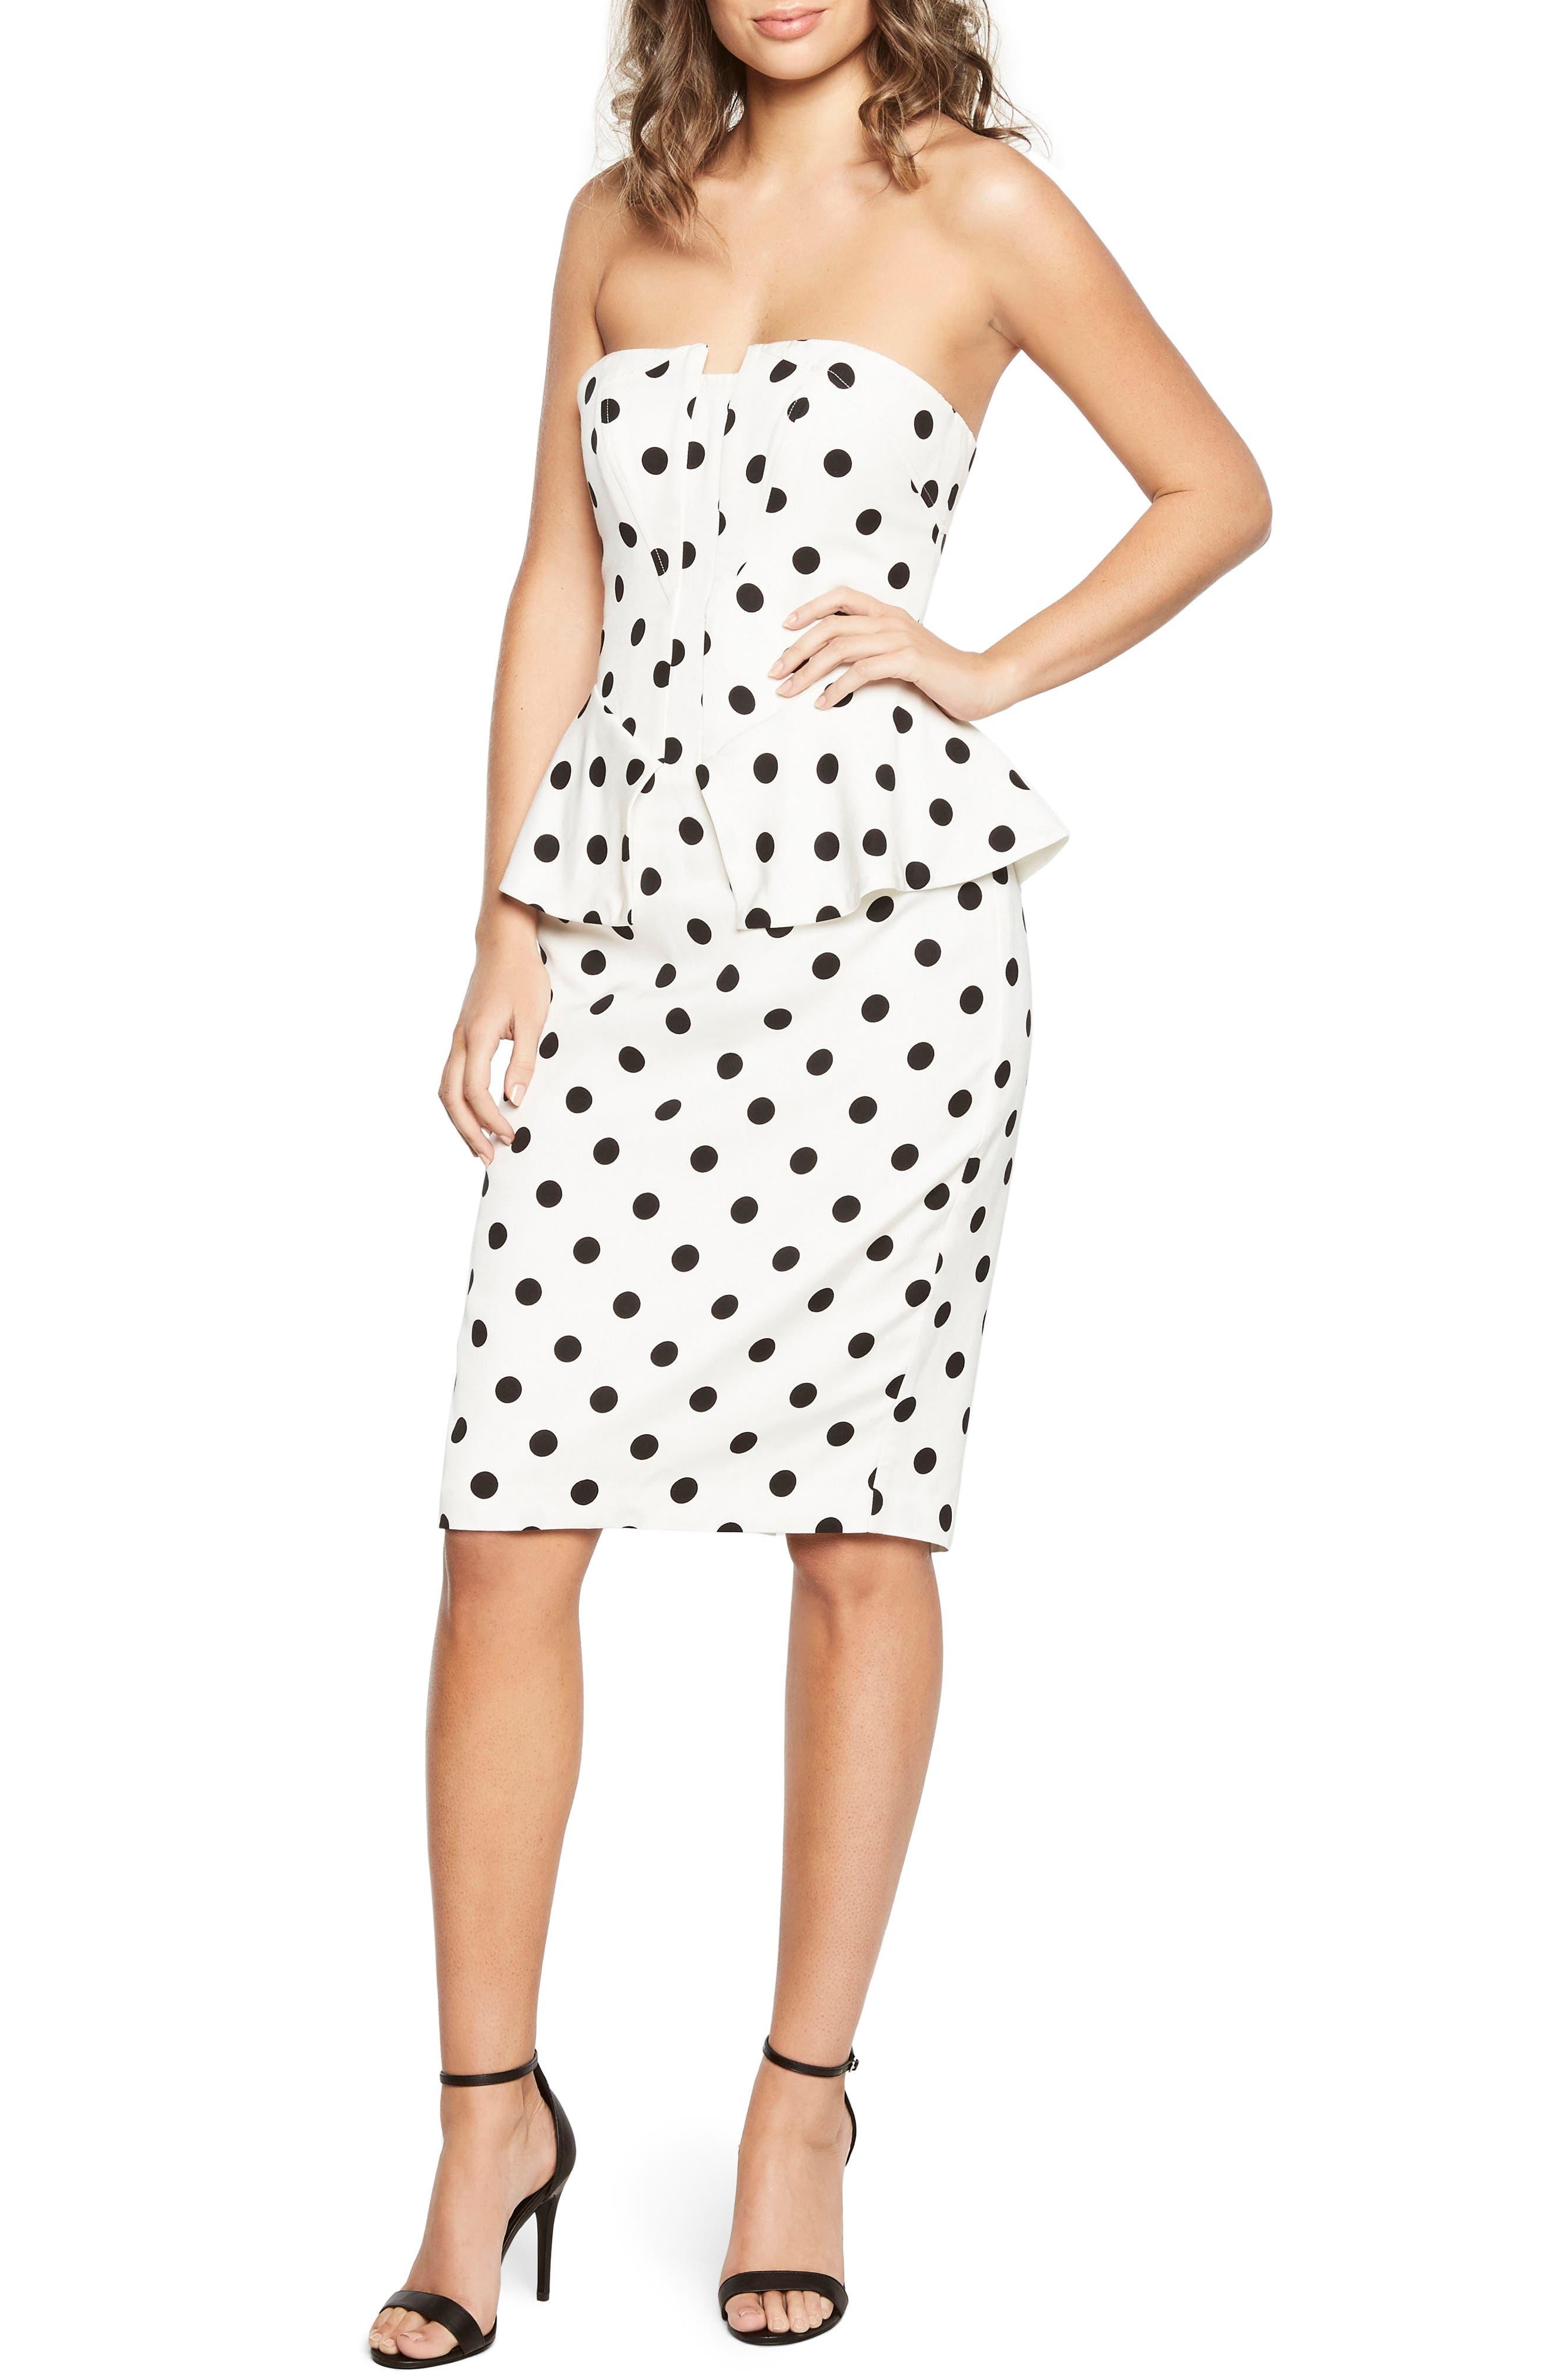 Suri Polka Dot Peplum Dress,                             Main thumbnail 1, color,                             White Spot